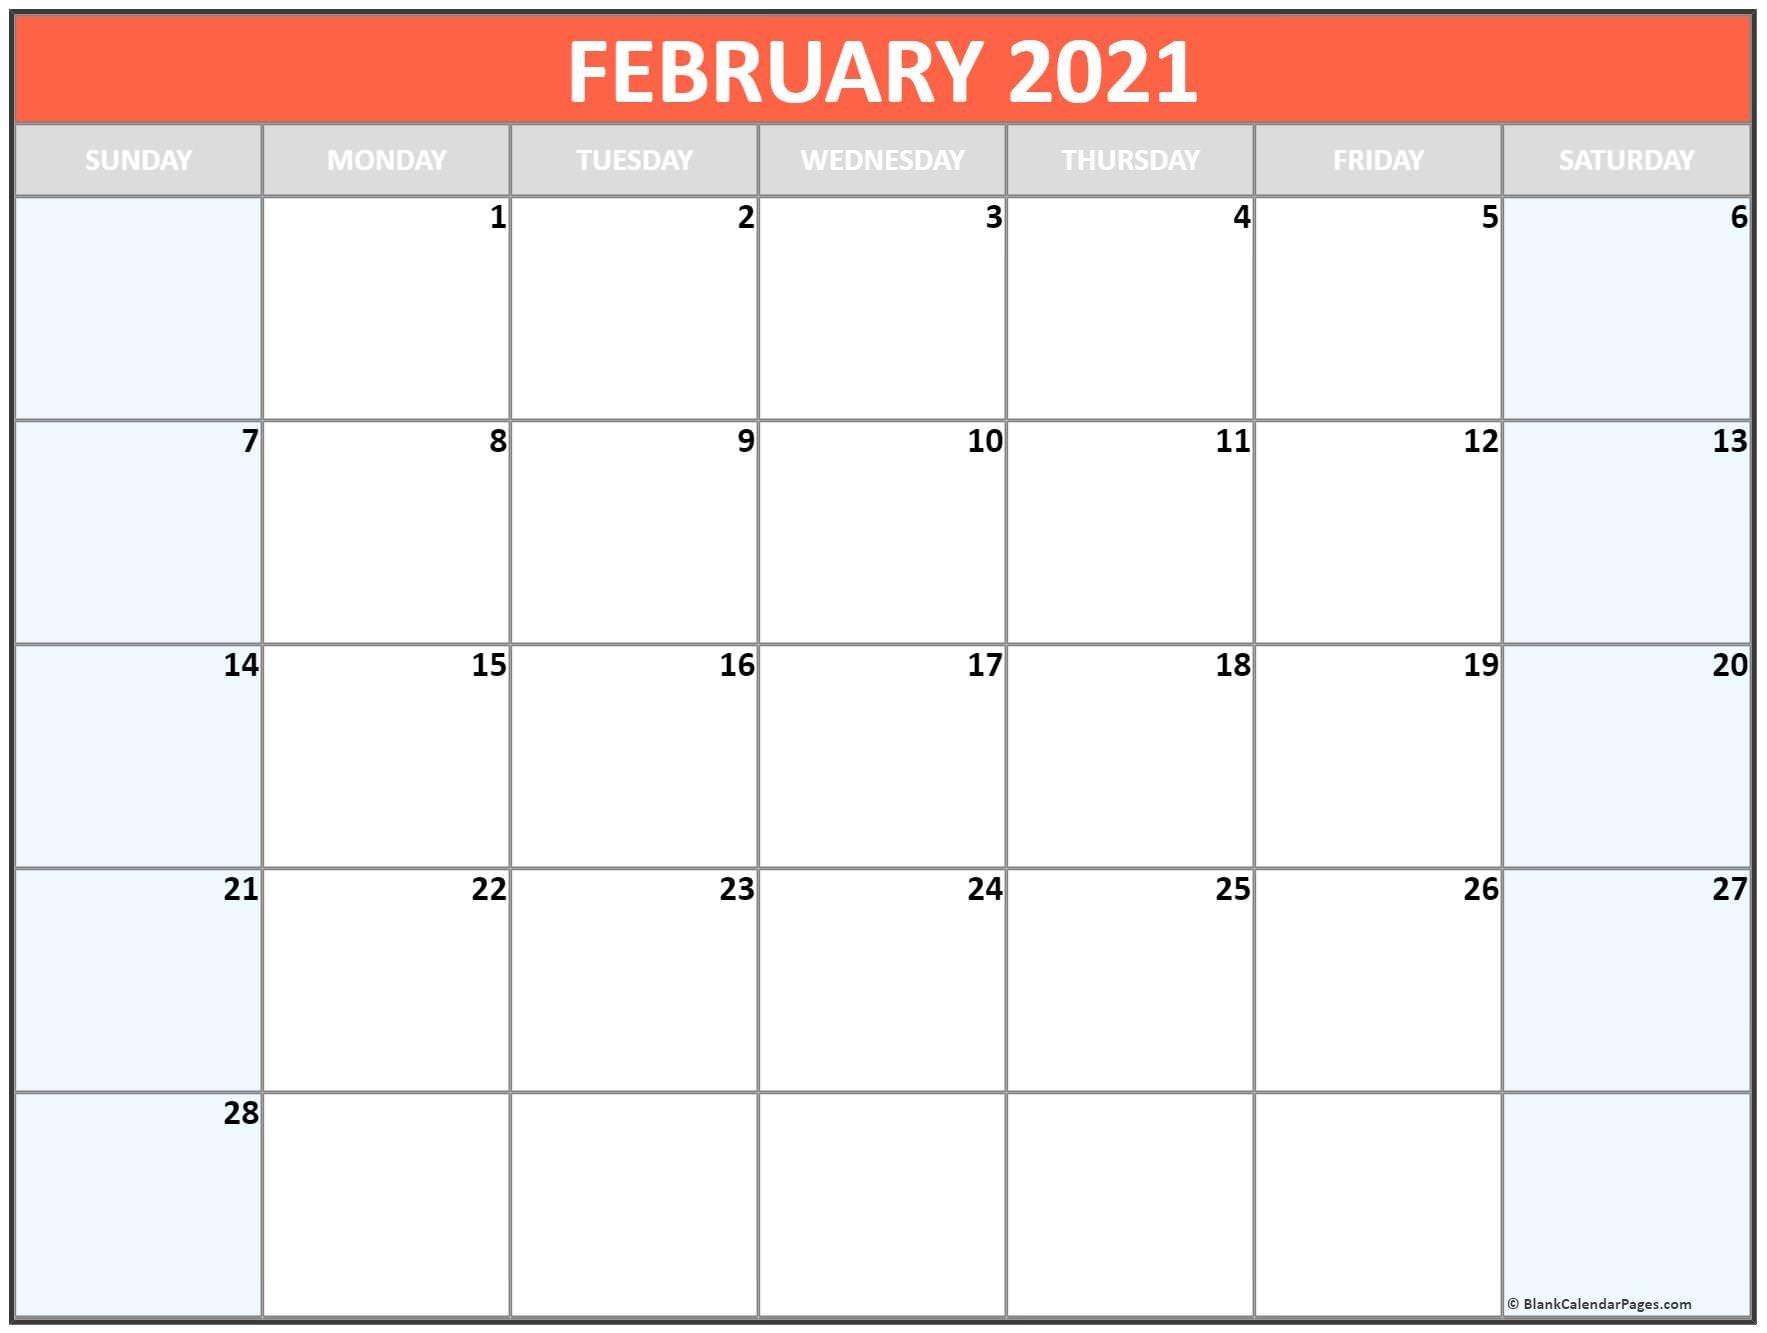 February 2021 Blank Calendar Collection.